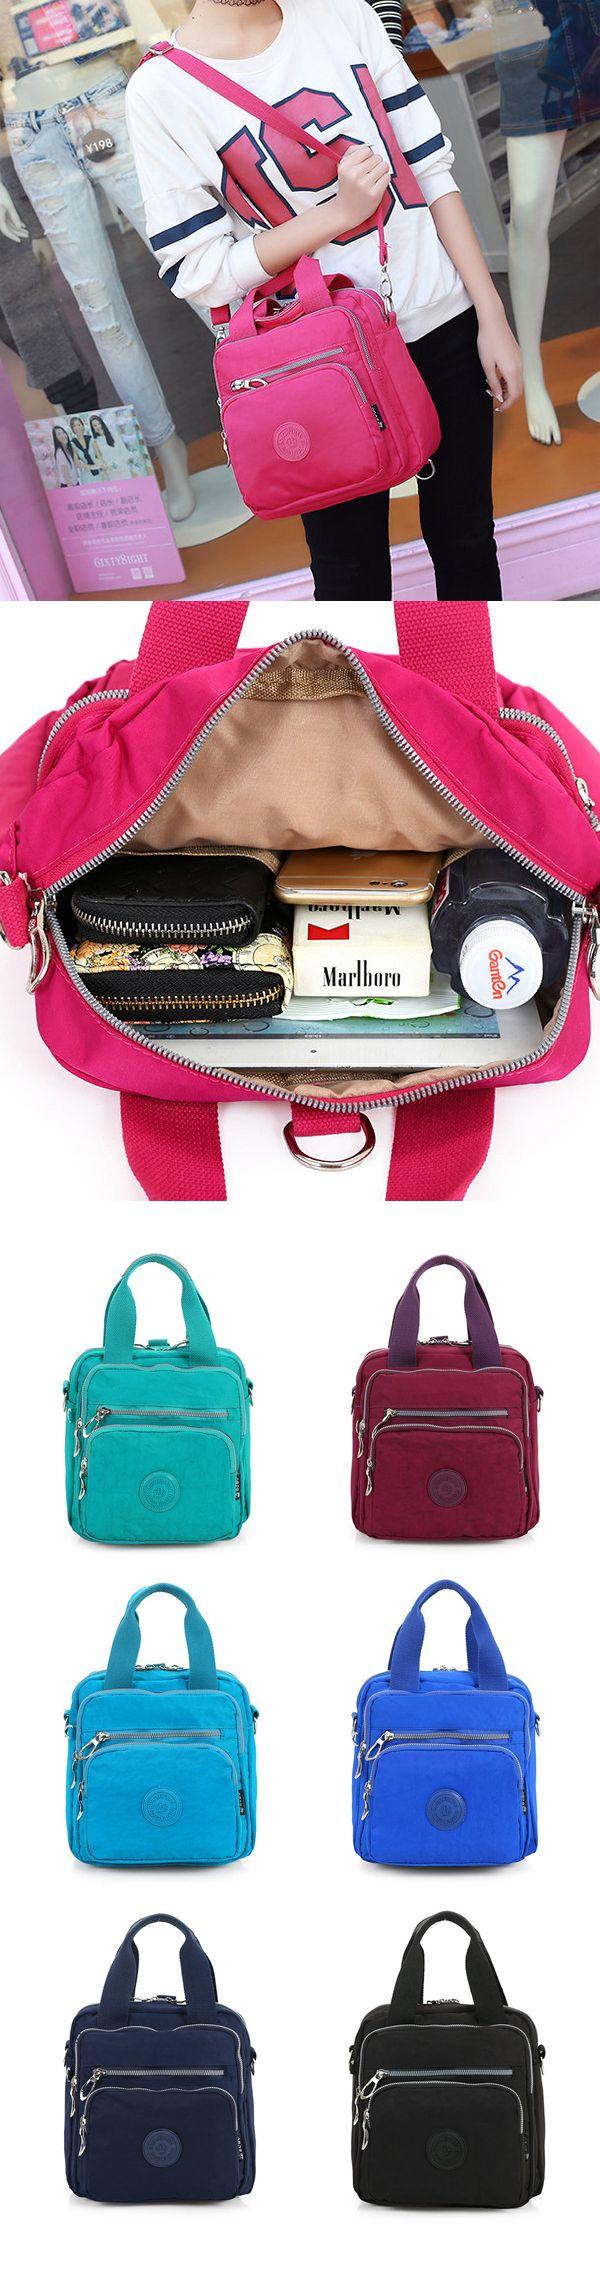 [$ 19.63]  Multifunctional Waterproof Nylon Large Capacity Multi-pocket Shoulder Bags Crossbody Bags Handbags